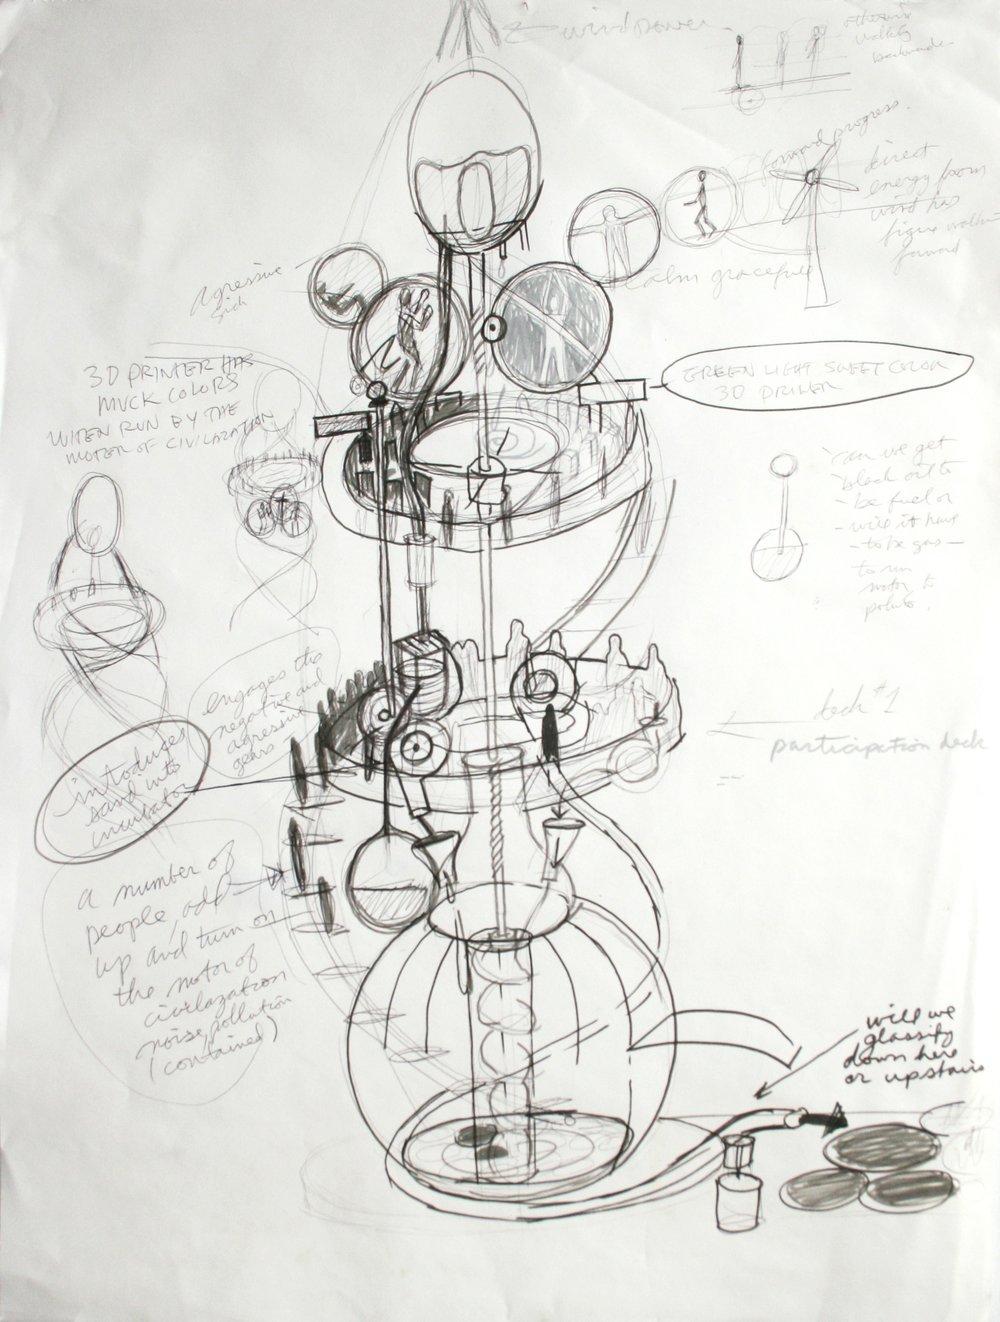 Organograph1.jpg